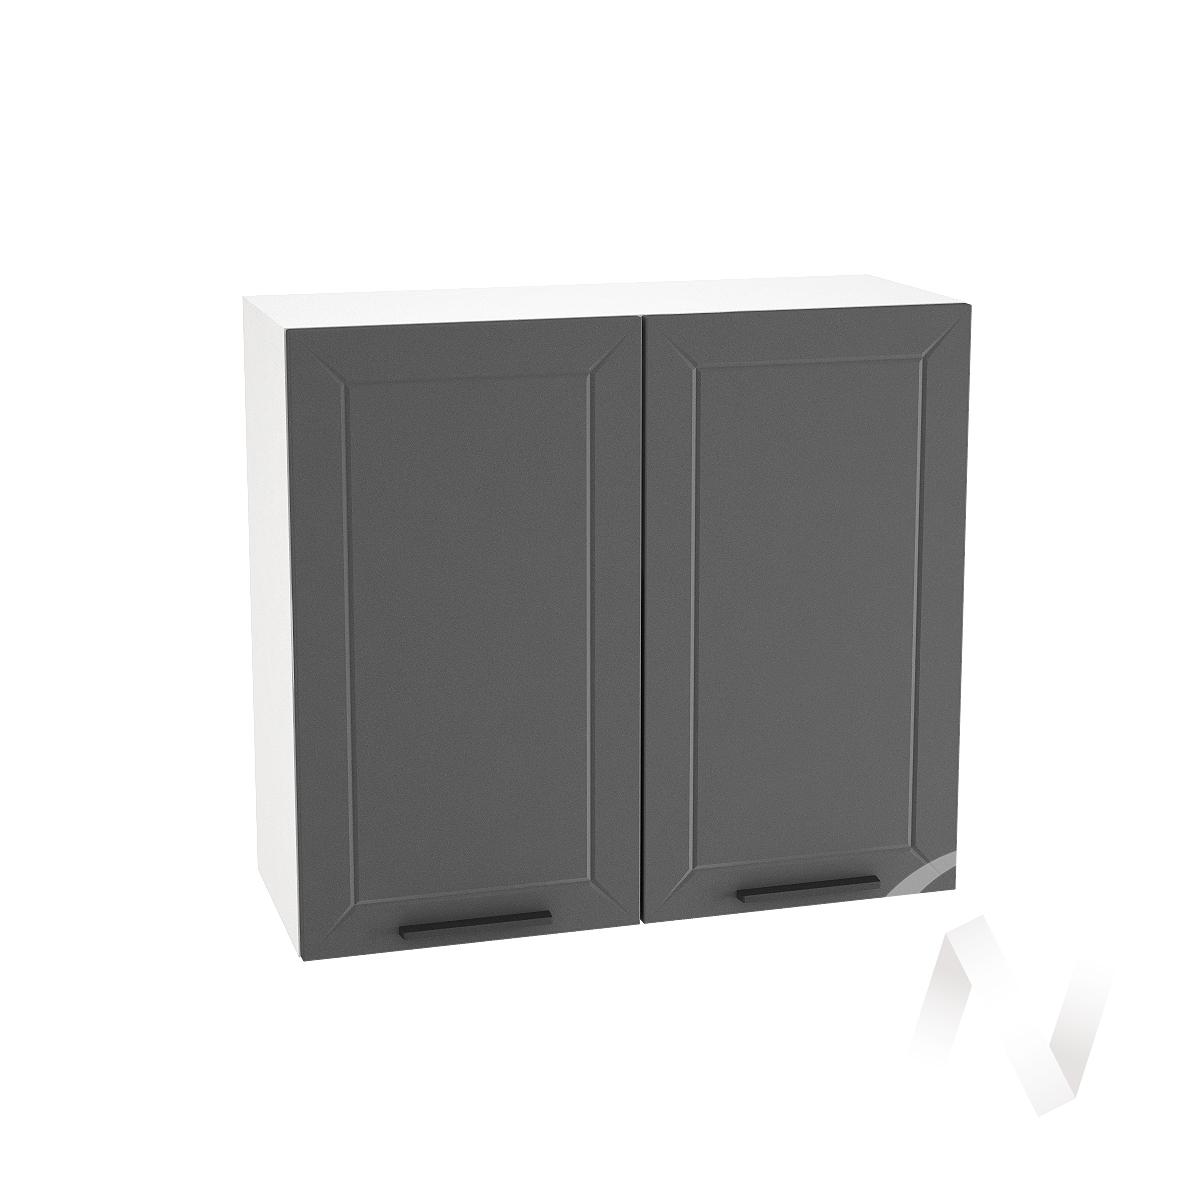 "Кухня ""Глетчер"": Шкаф верхний 800, ШВ 800 (Маренго силк/корпус белый)"